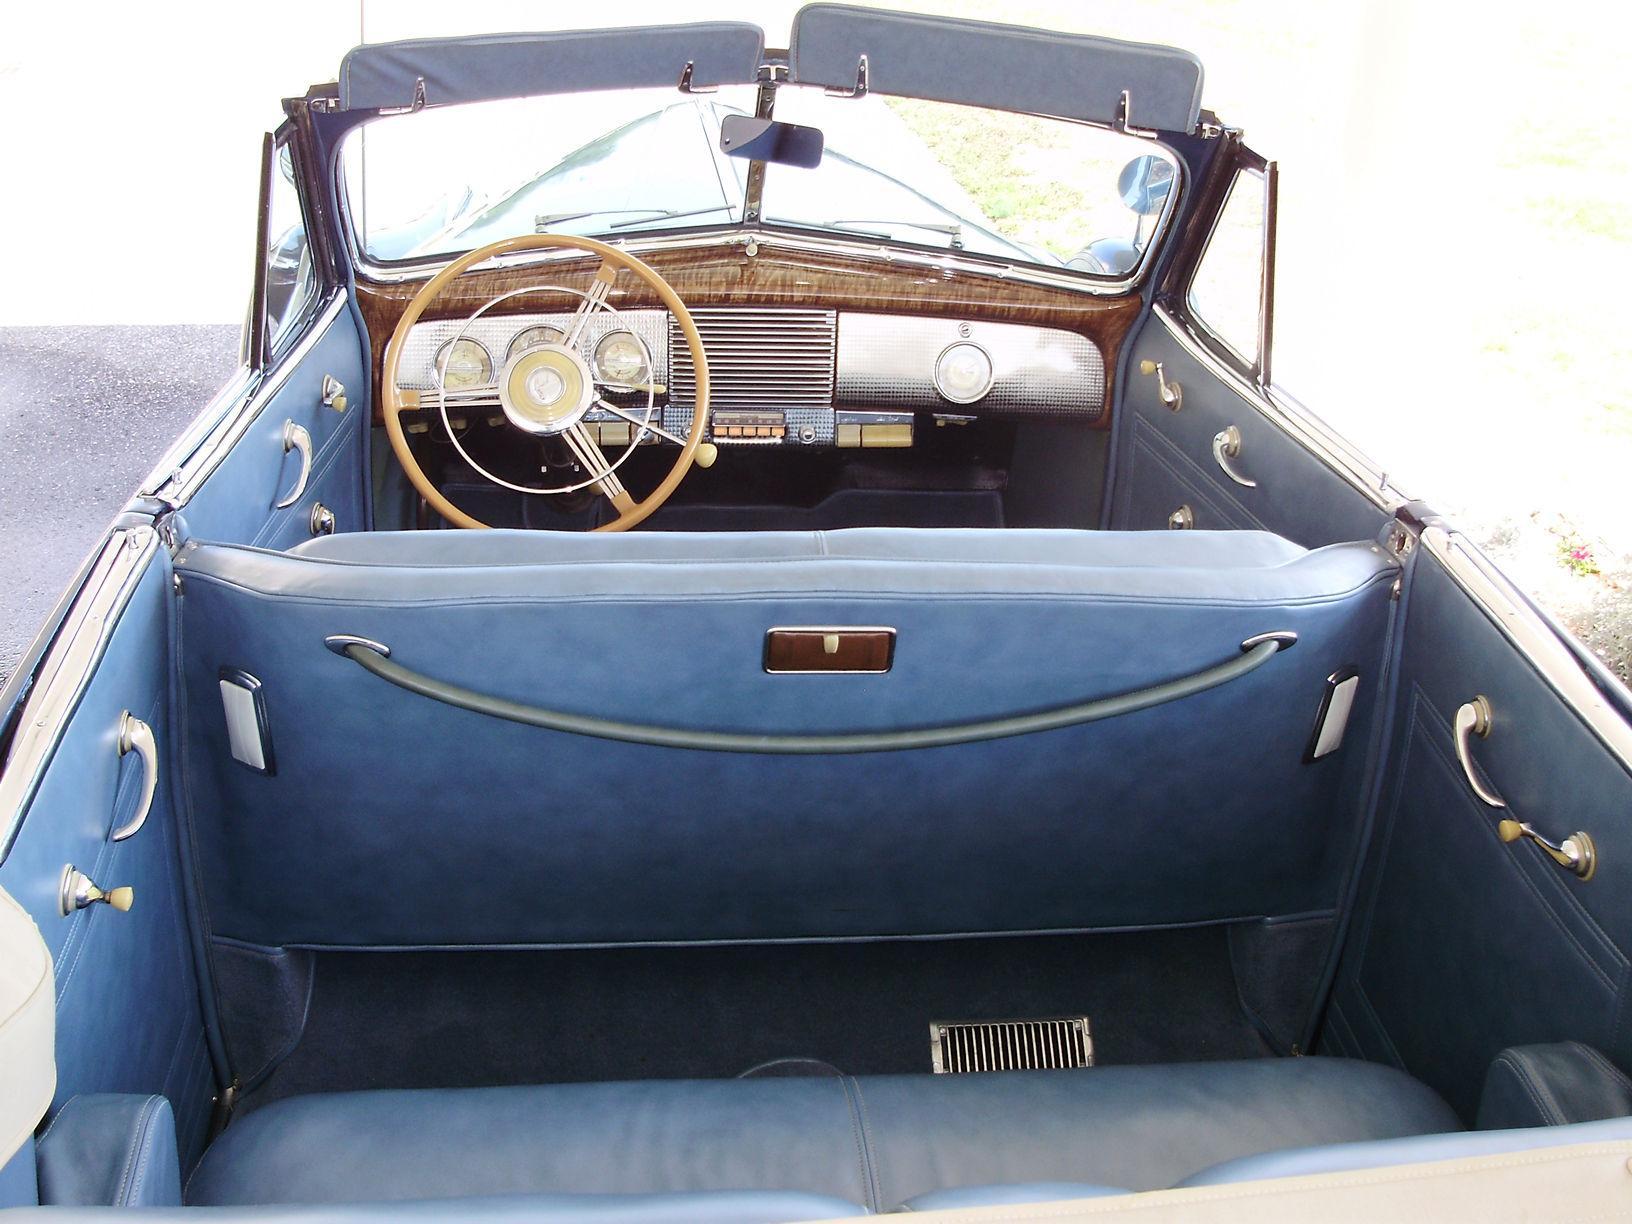 1940 BUICK CENTURY CONVERTIBLE SEDAN - Vintage Motors of Sarasota Inc. #22